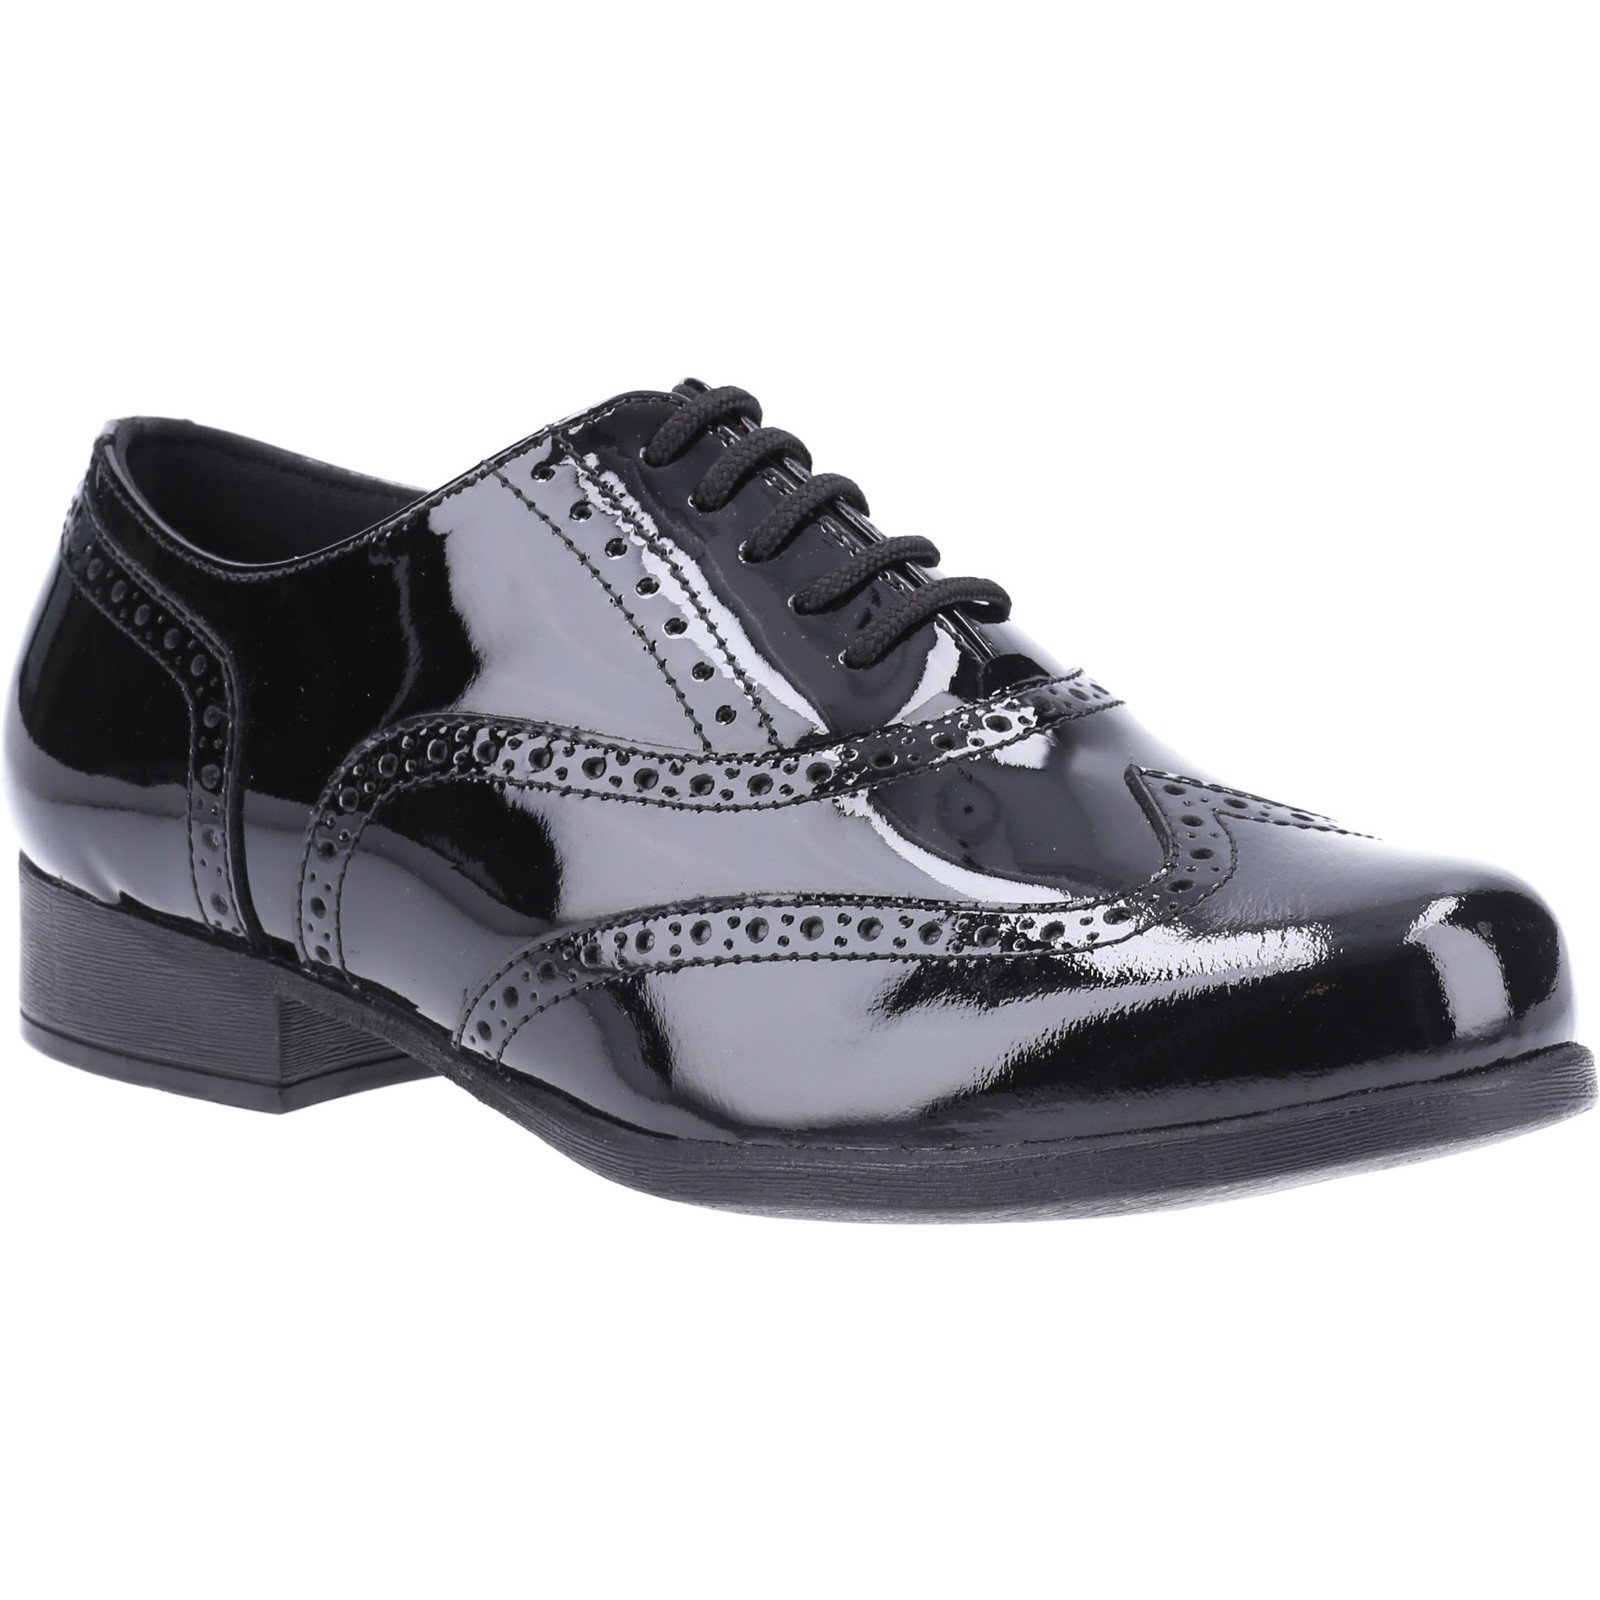 Hush Puppies Kid's Kada Junior School Brogue Shoe Patent Black 32597 - Patent Black 3